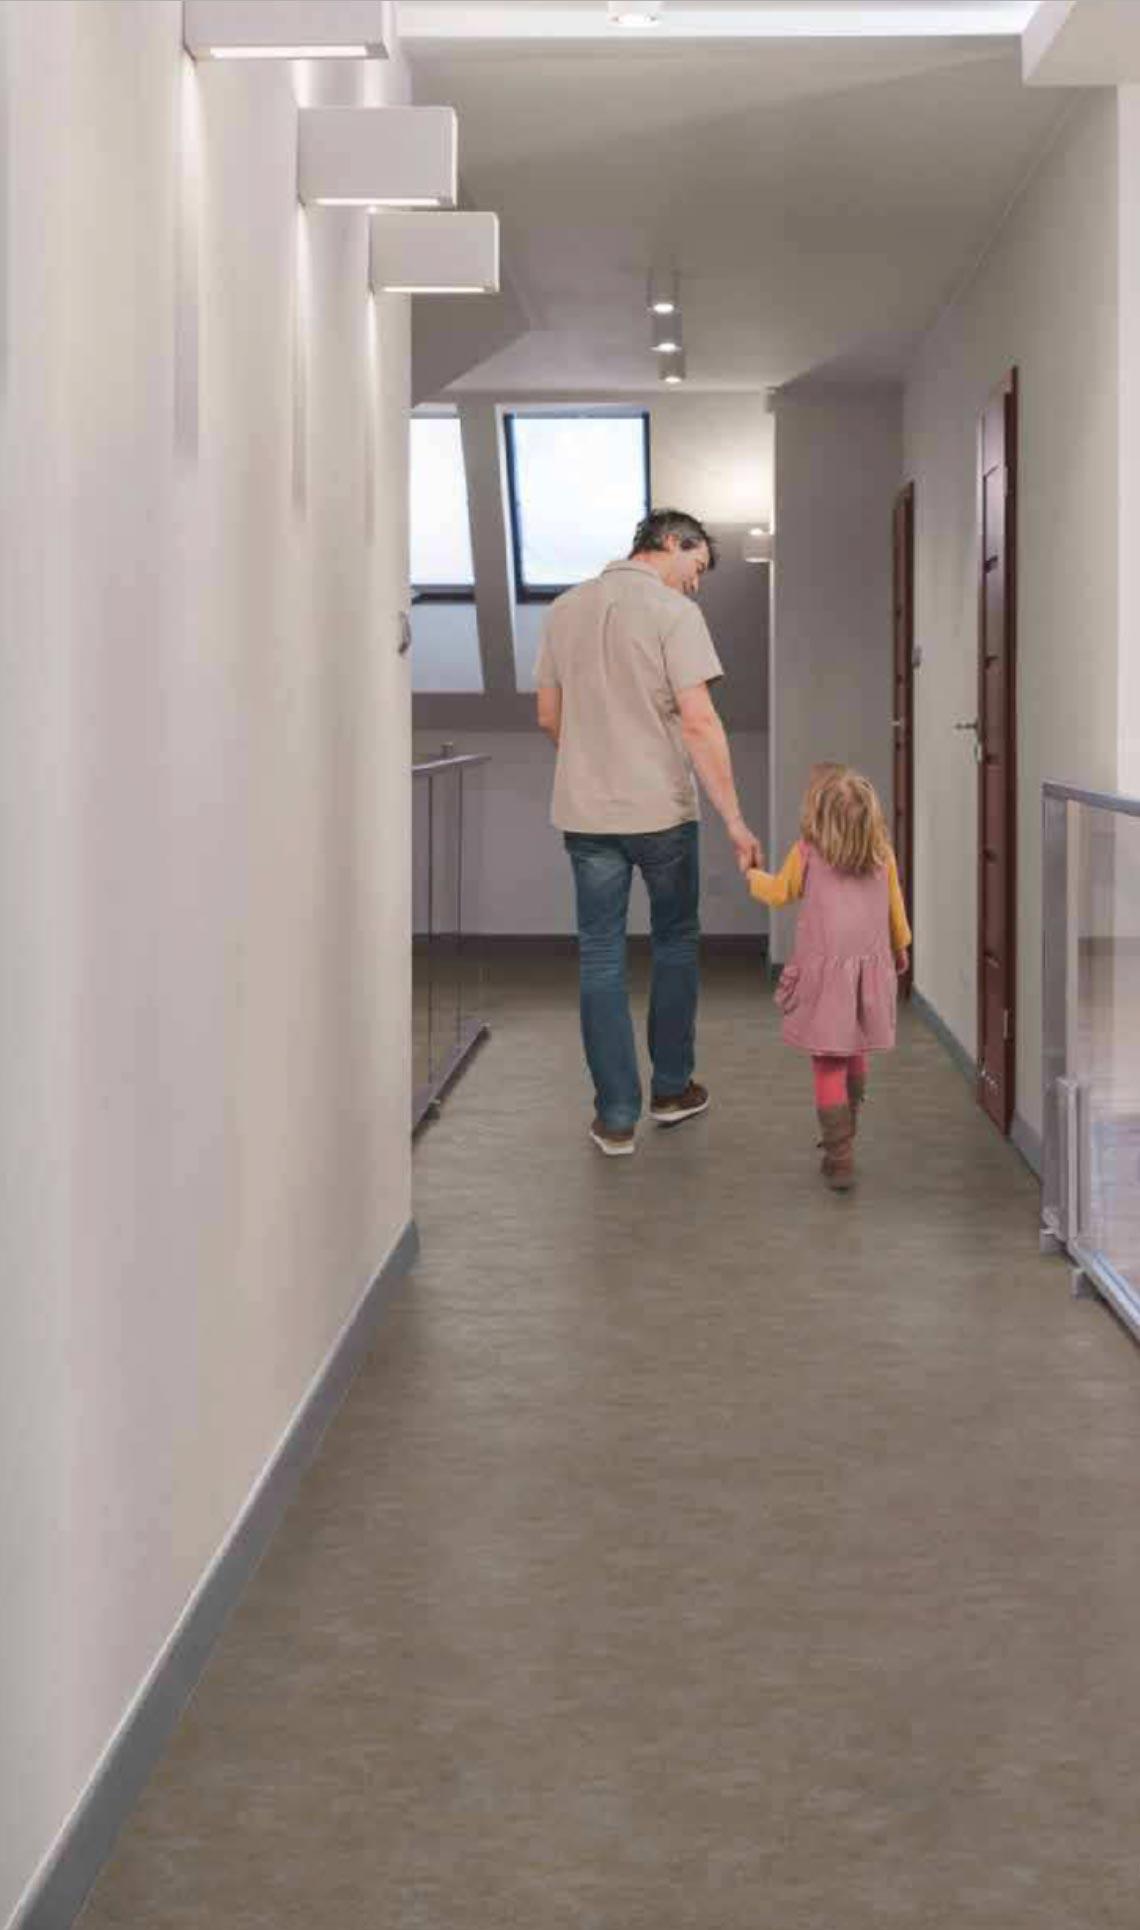 padre e hija caminando en pasillo de hotel